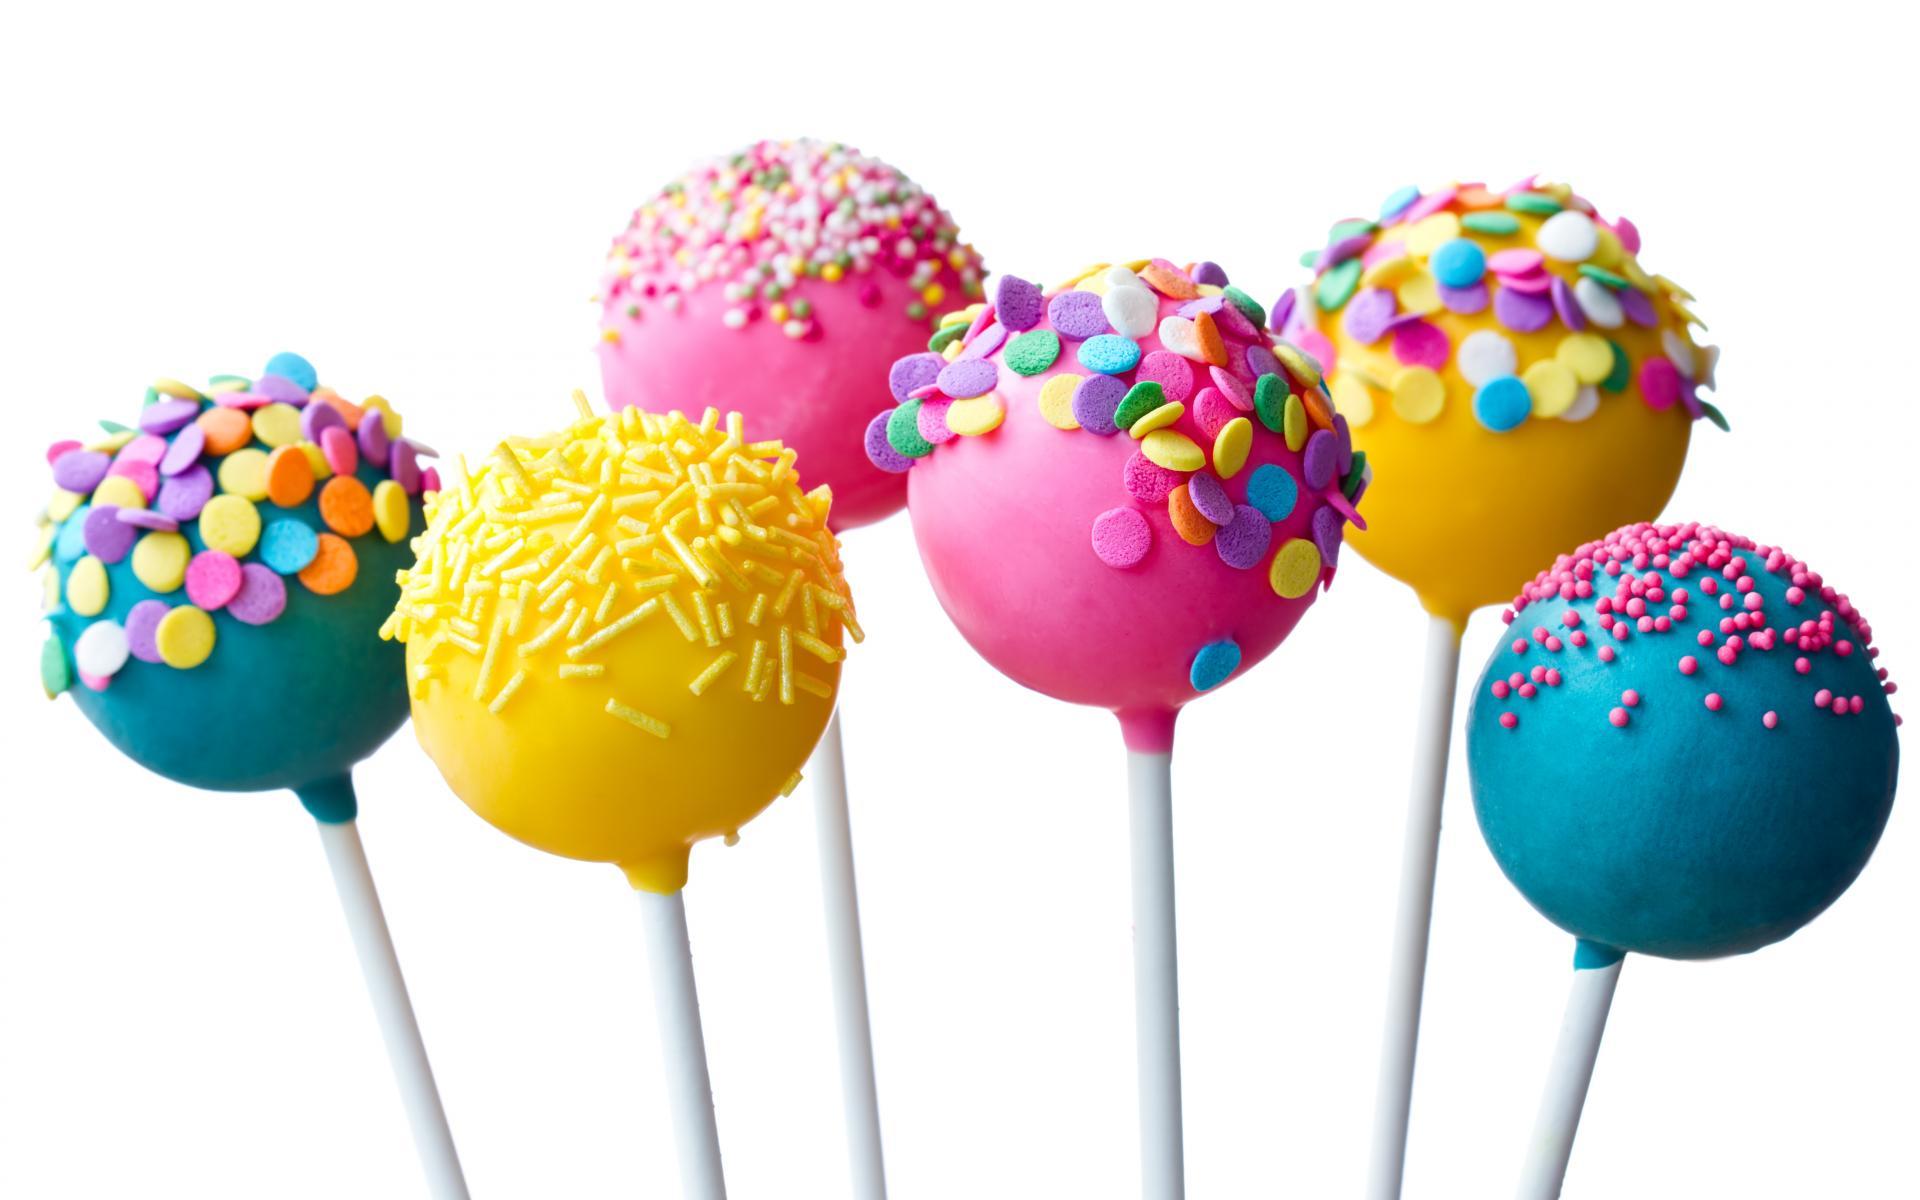 Colorful Lollipop Candies HD Wallpaper - Lollipop PNG HD